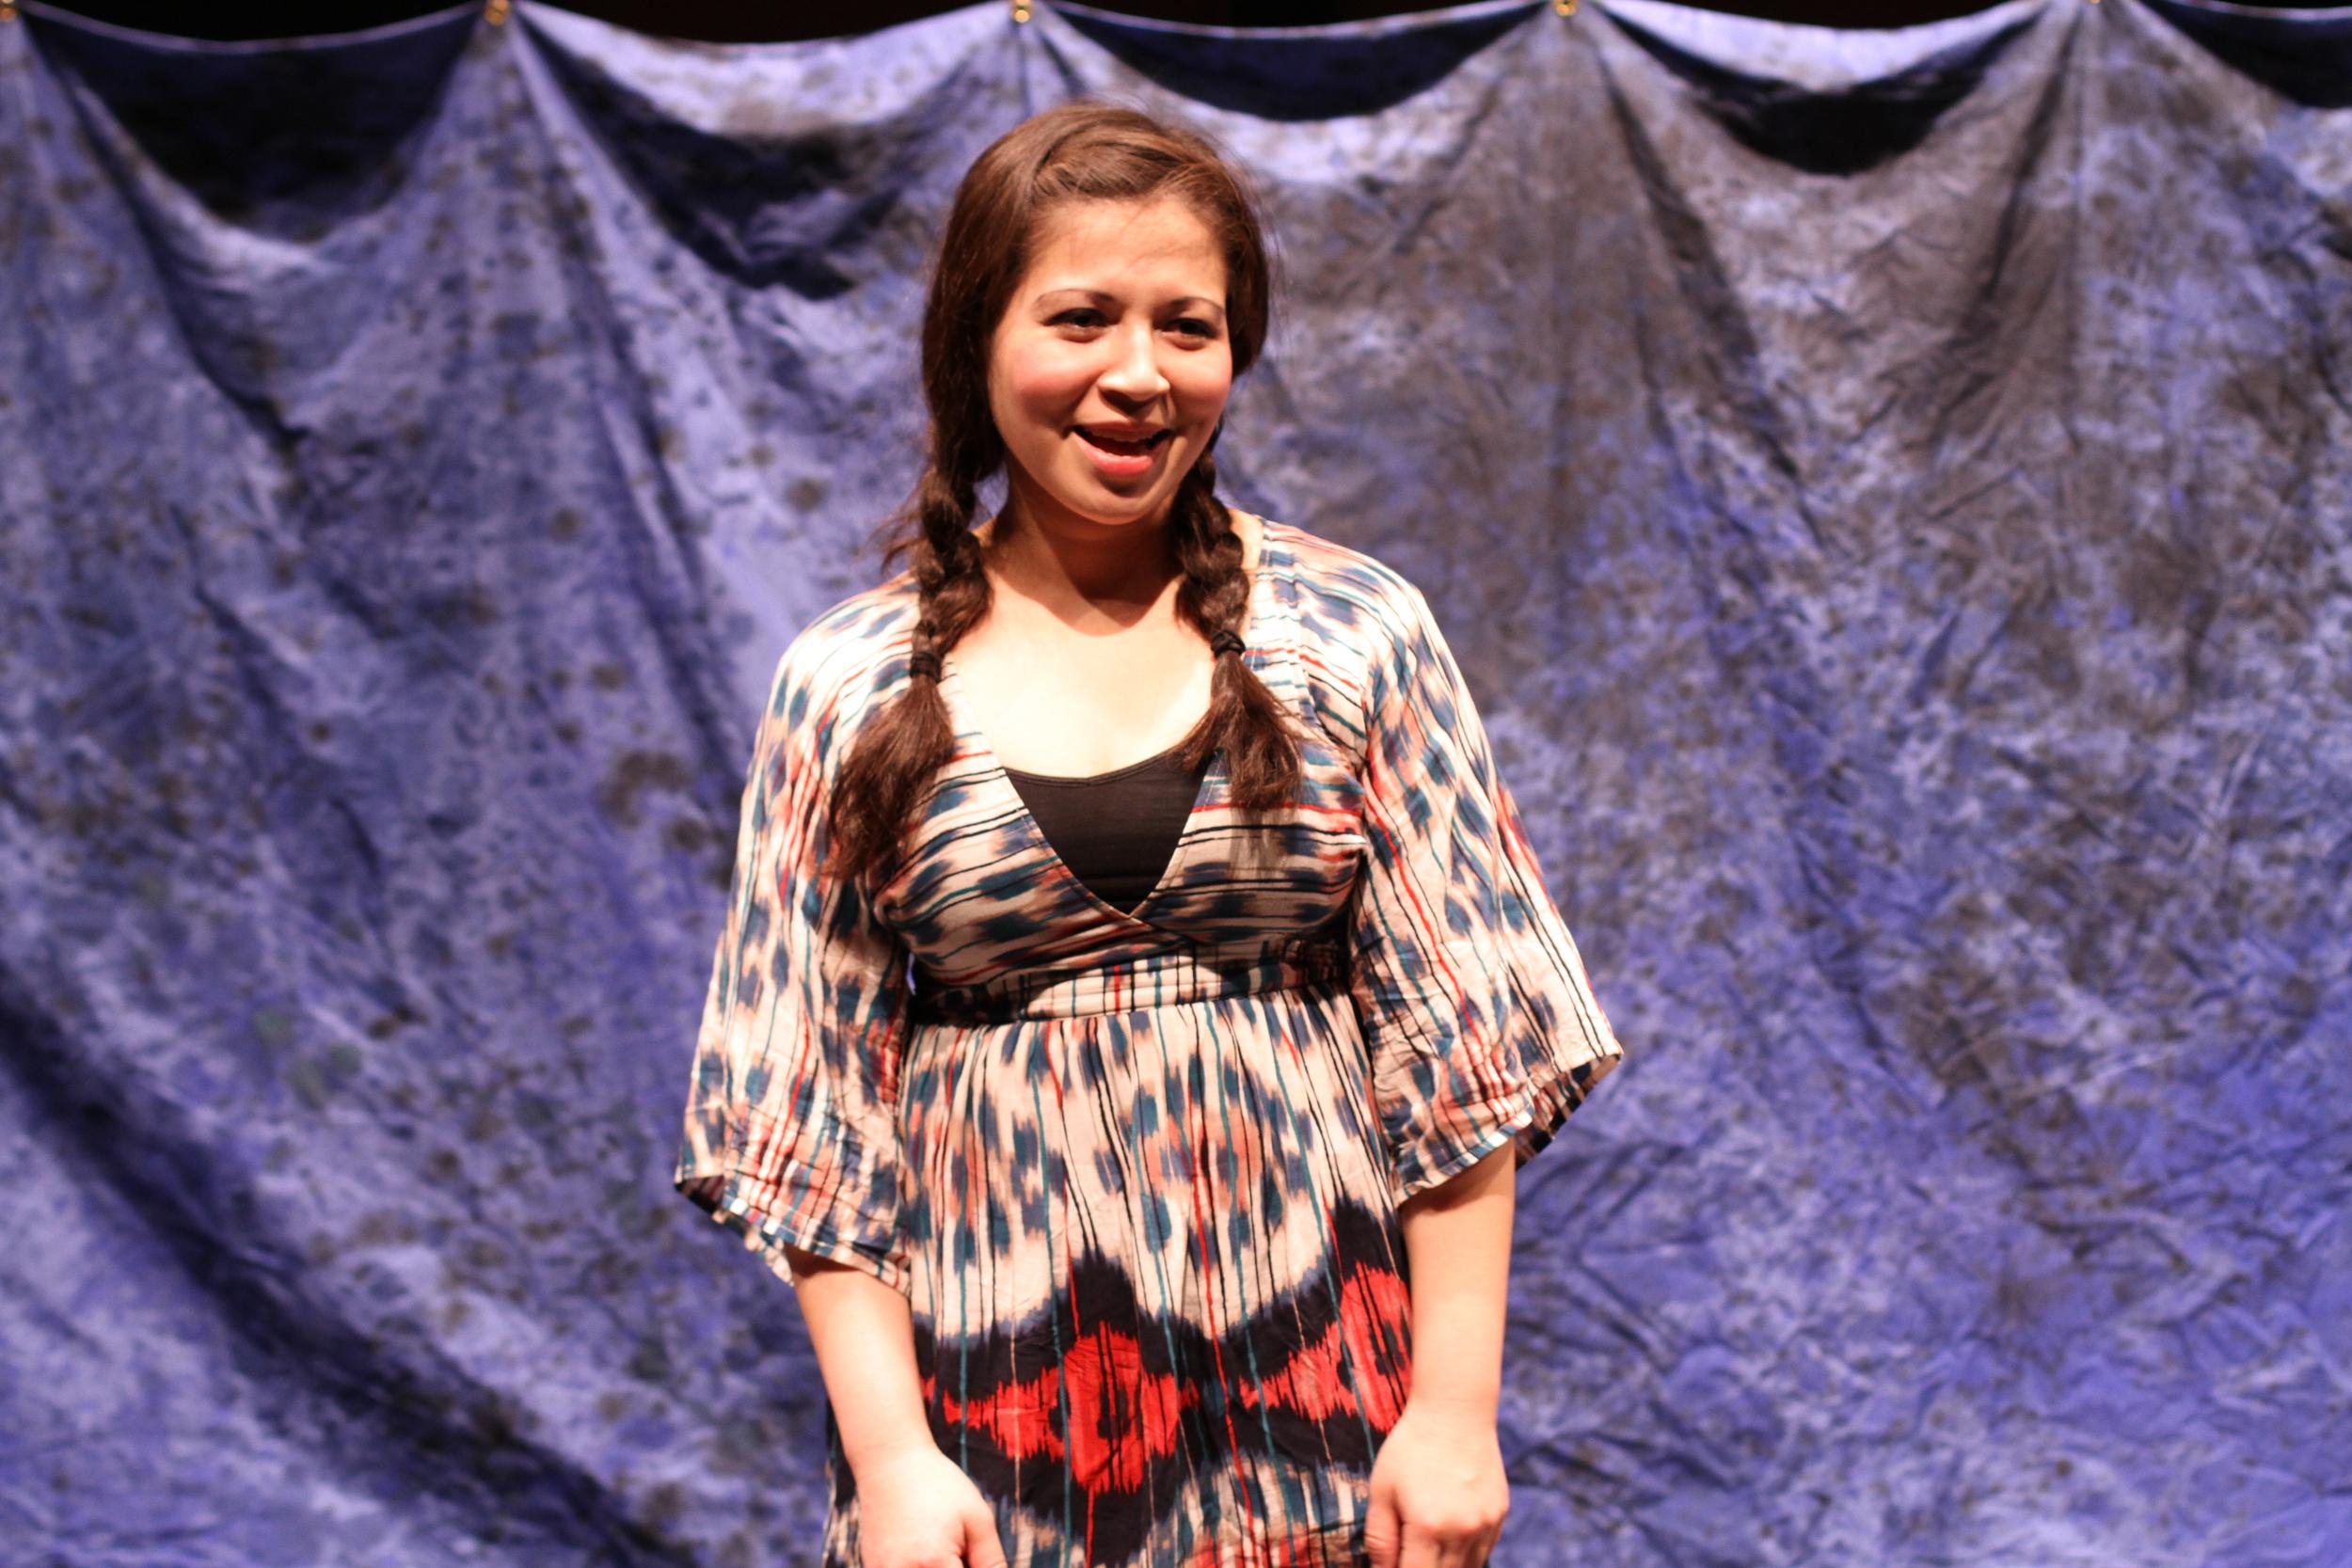 Angela Sperazza - Production Photo #2.JPG